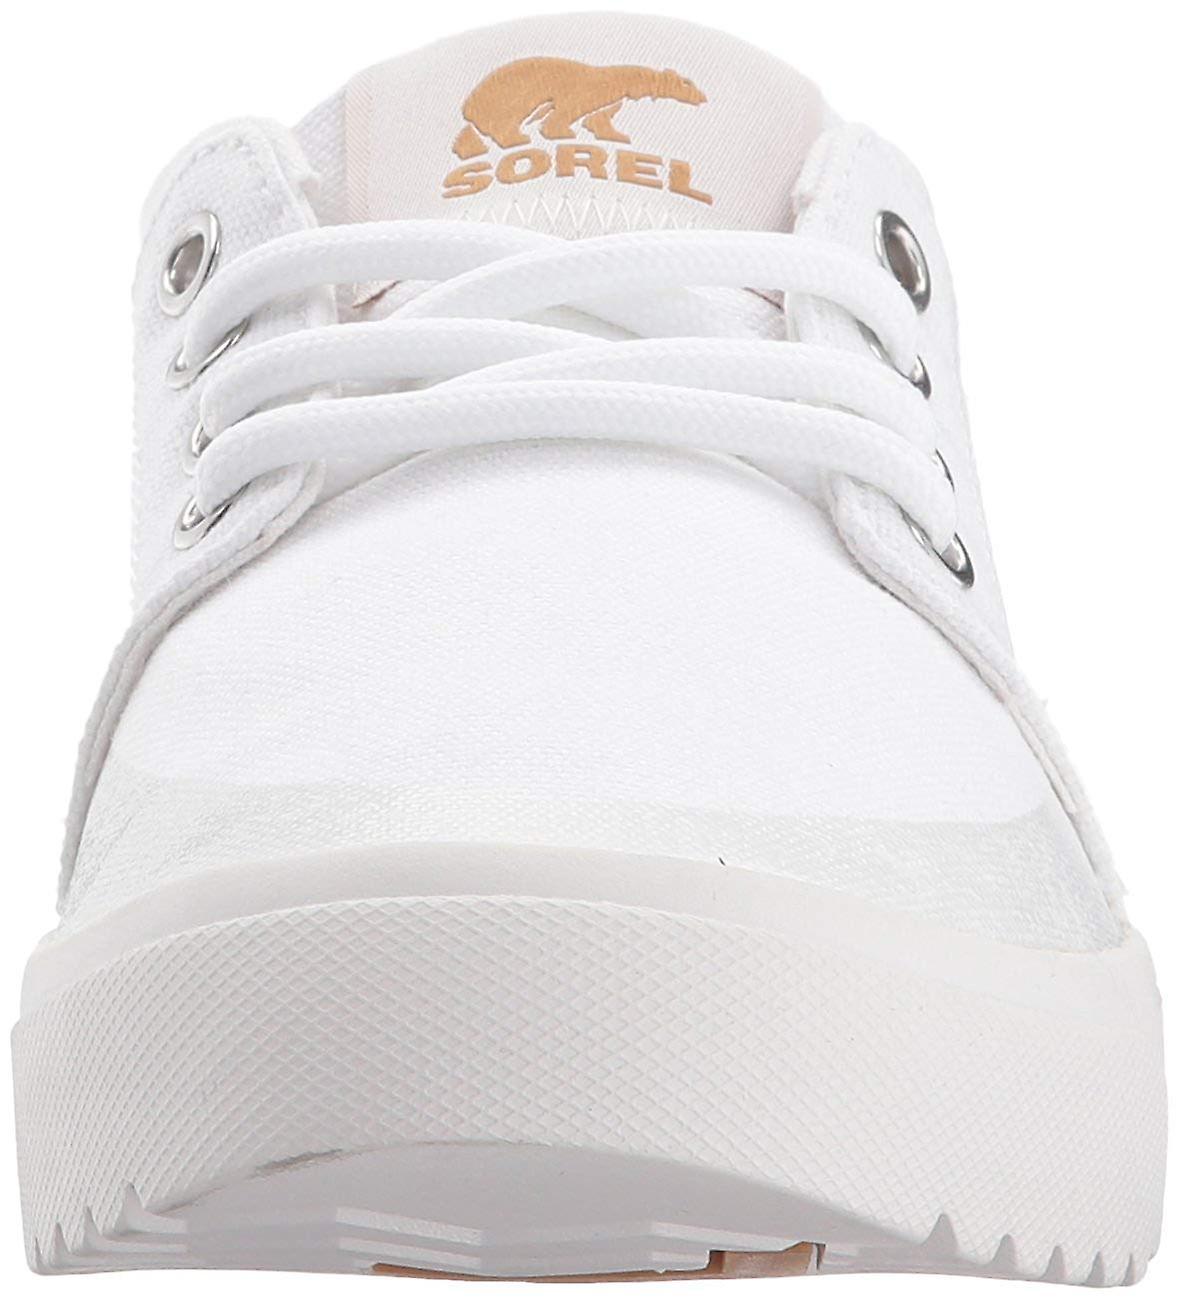 Sorel Womens Campsneak Fabric Low Top Lace Up Fashion Sneakers bGpBX